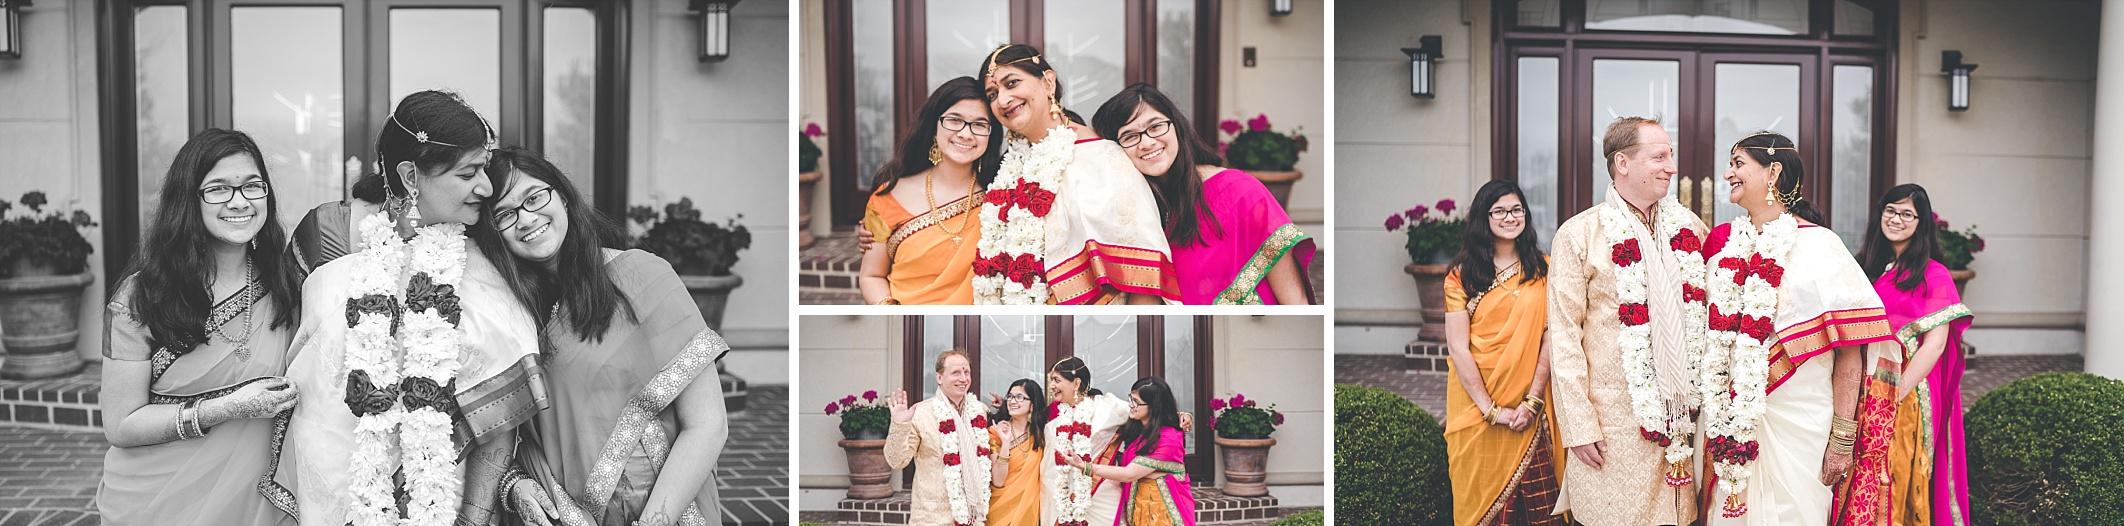 2690_dayton-indian-wedding-photographer-beavercreek_0046.jpg